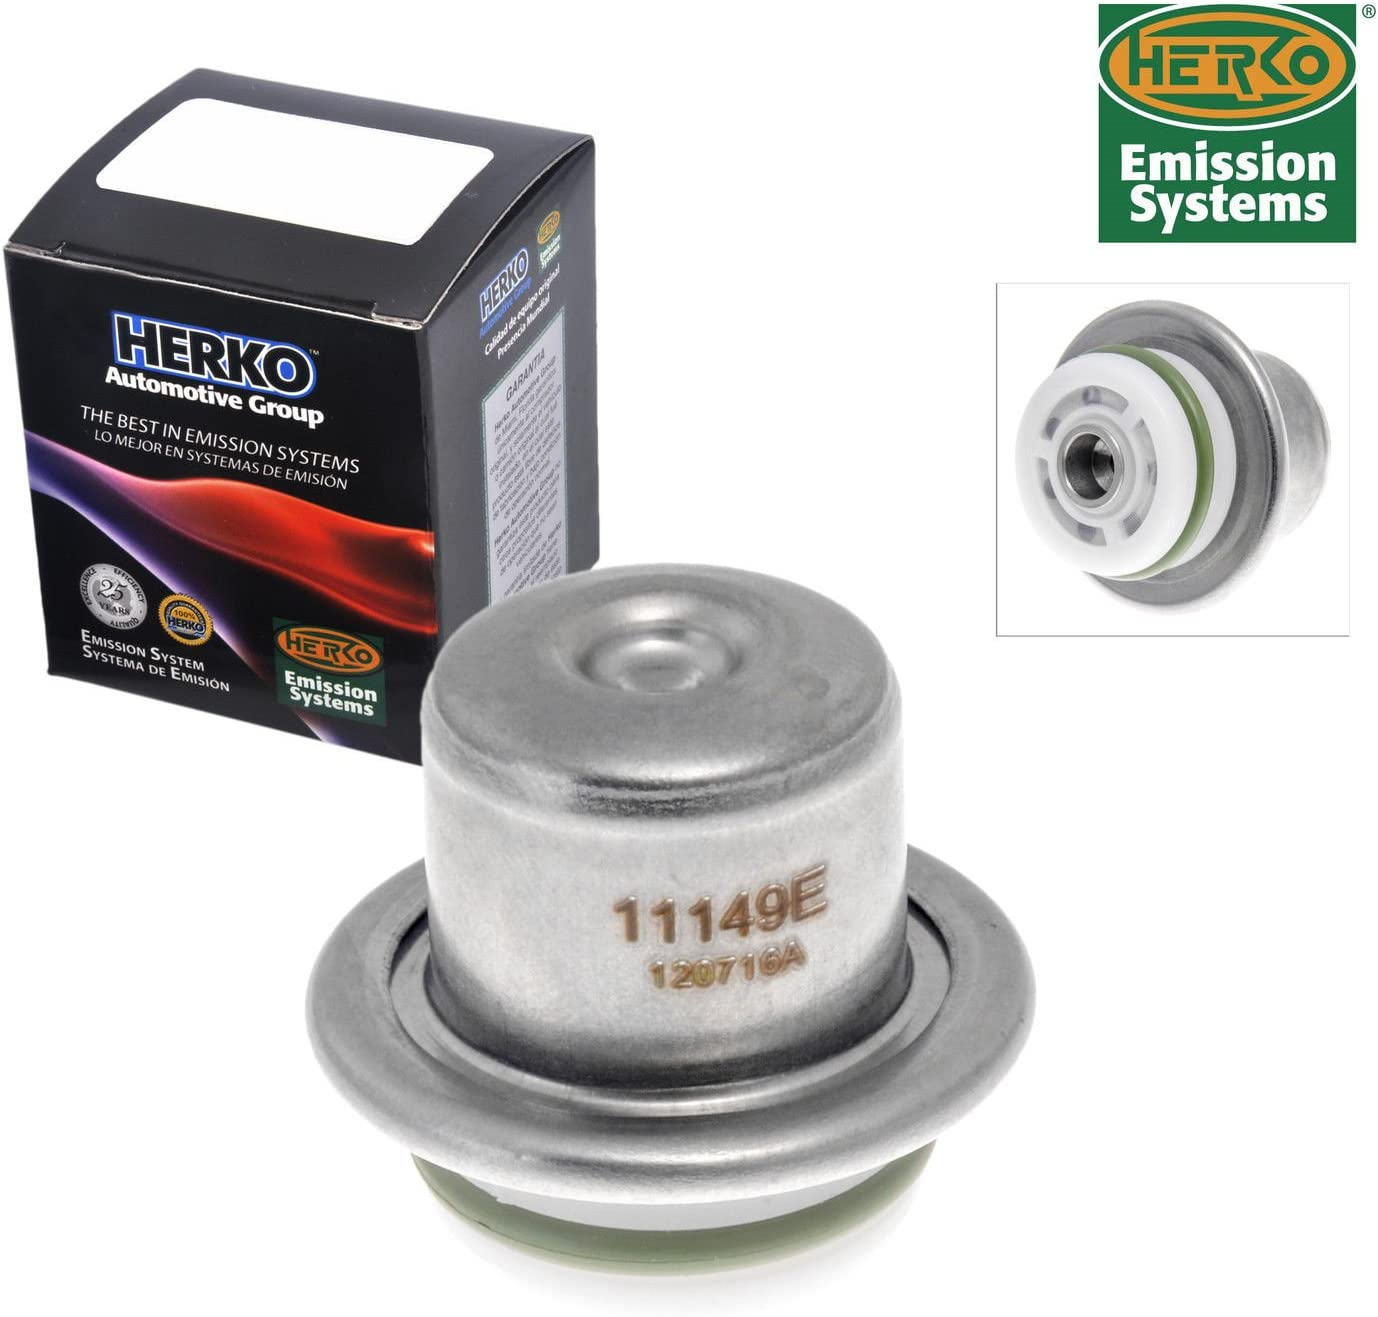 AD Auto Parts New Herko Fuel Pressure Regulator PR4115 for Mercedes-Benz 2001-2005